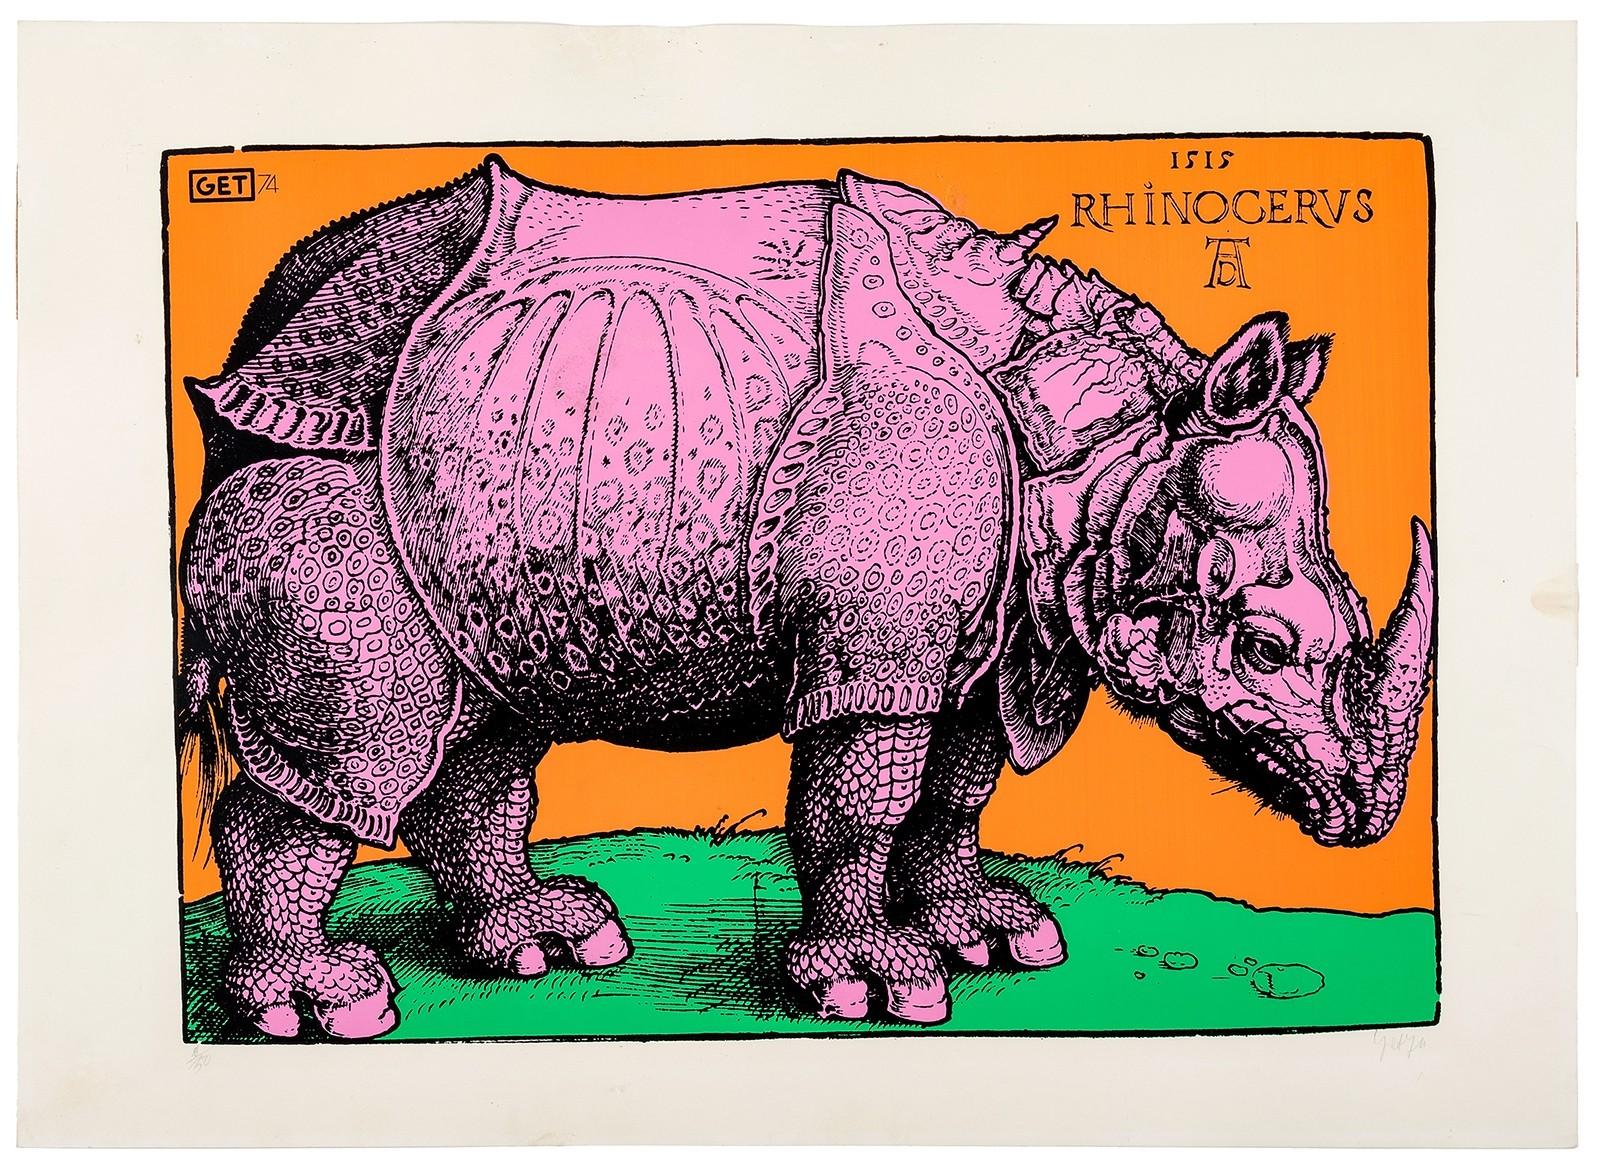 Nosorożec Dürera [Rhinocerus]